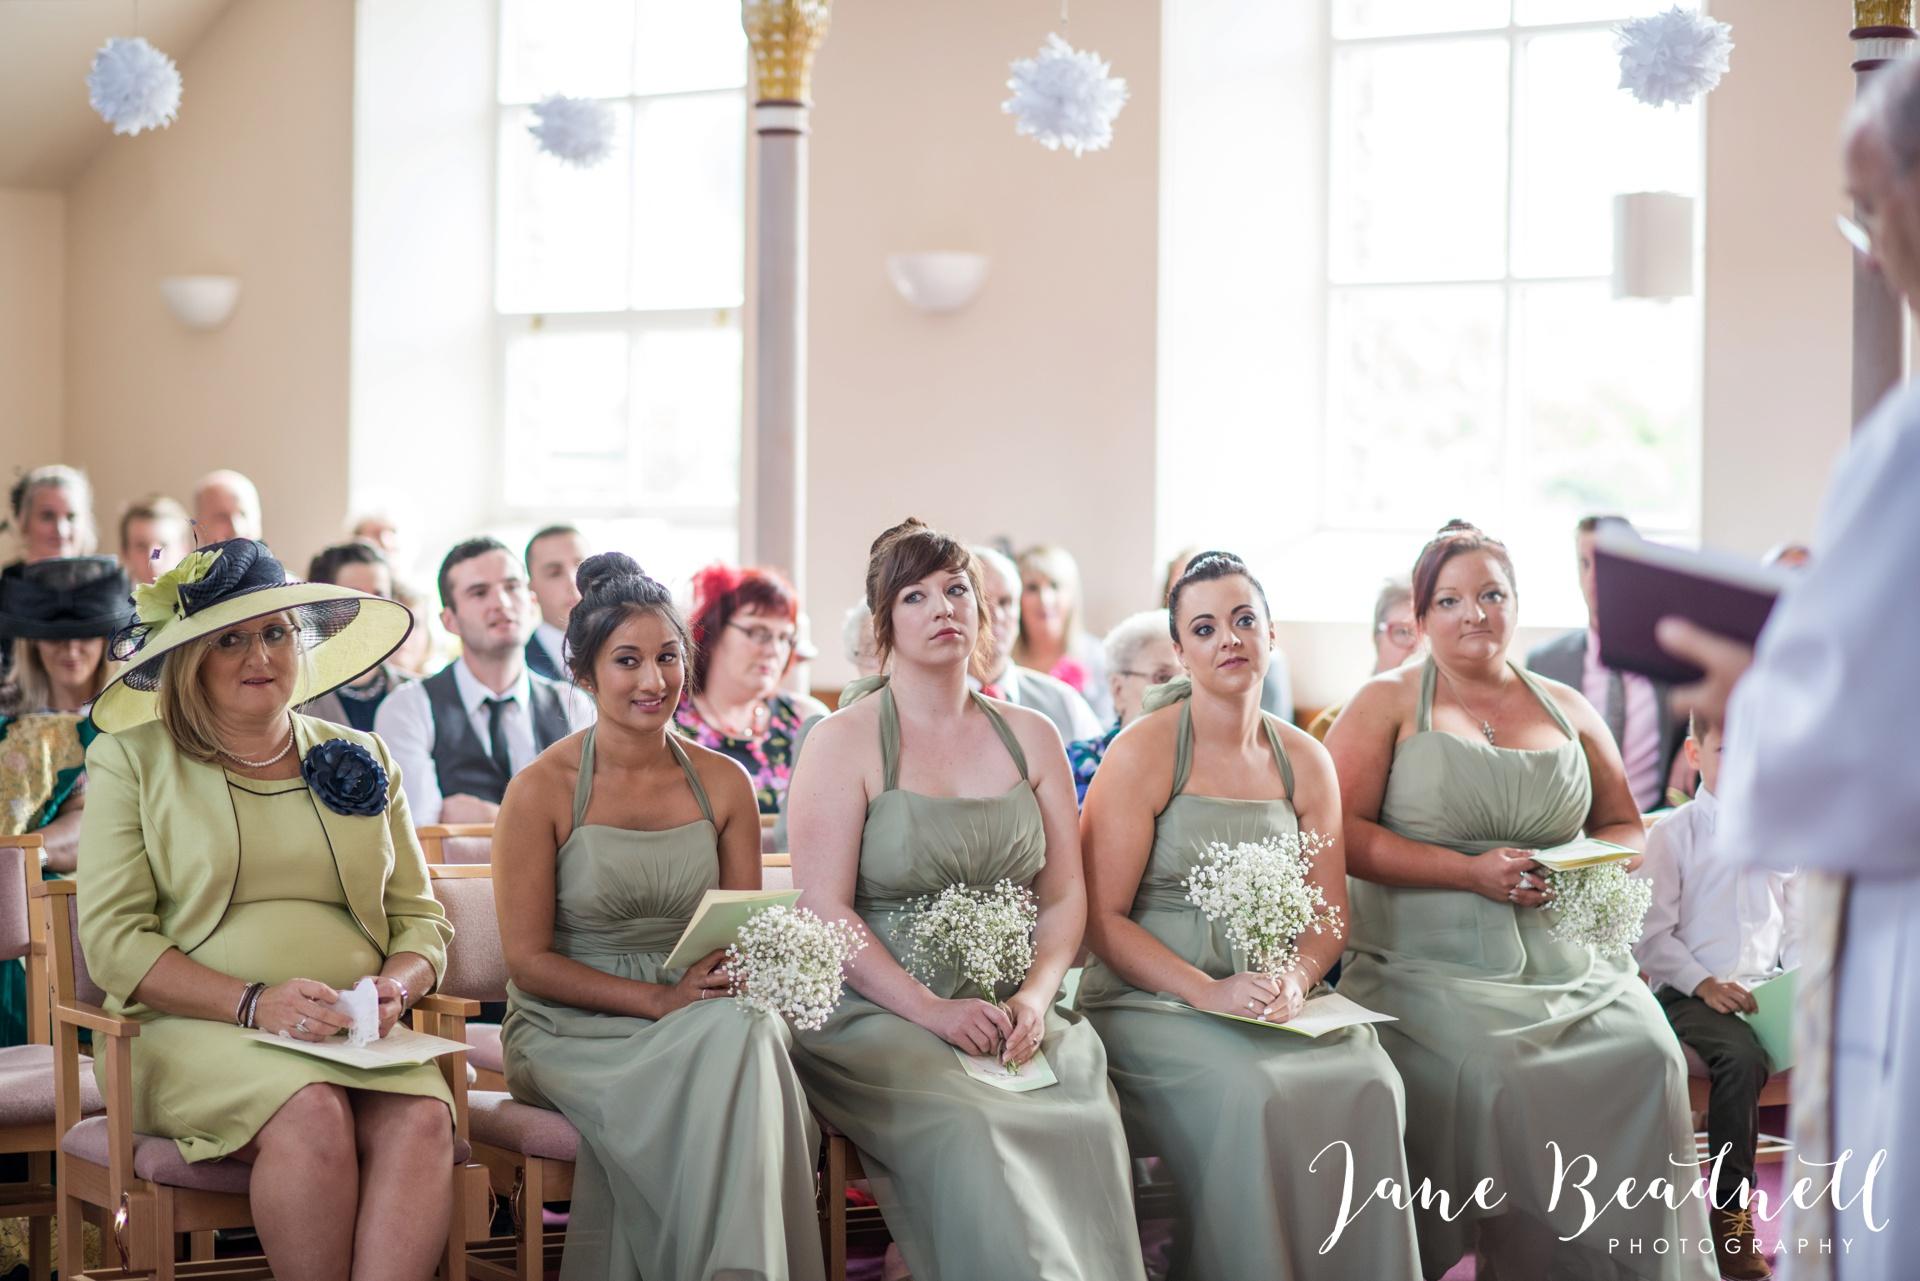 Jane Beadnell fine art wedding photographer The Old Deanery Ripon_0032